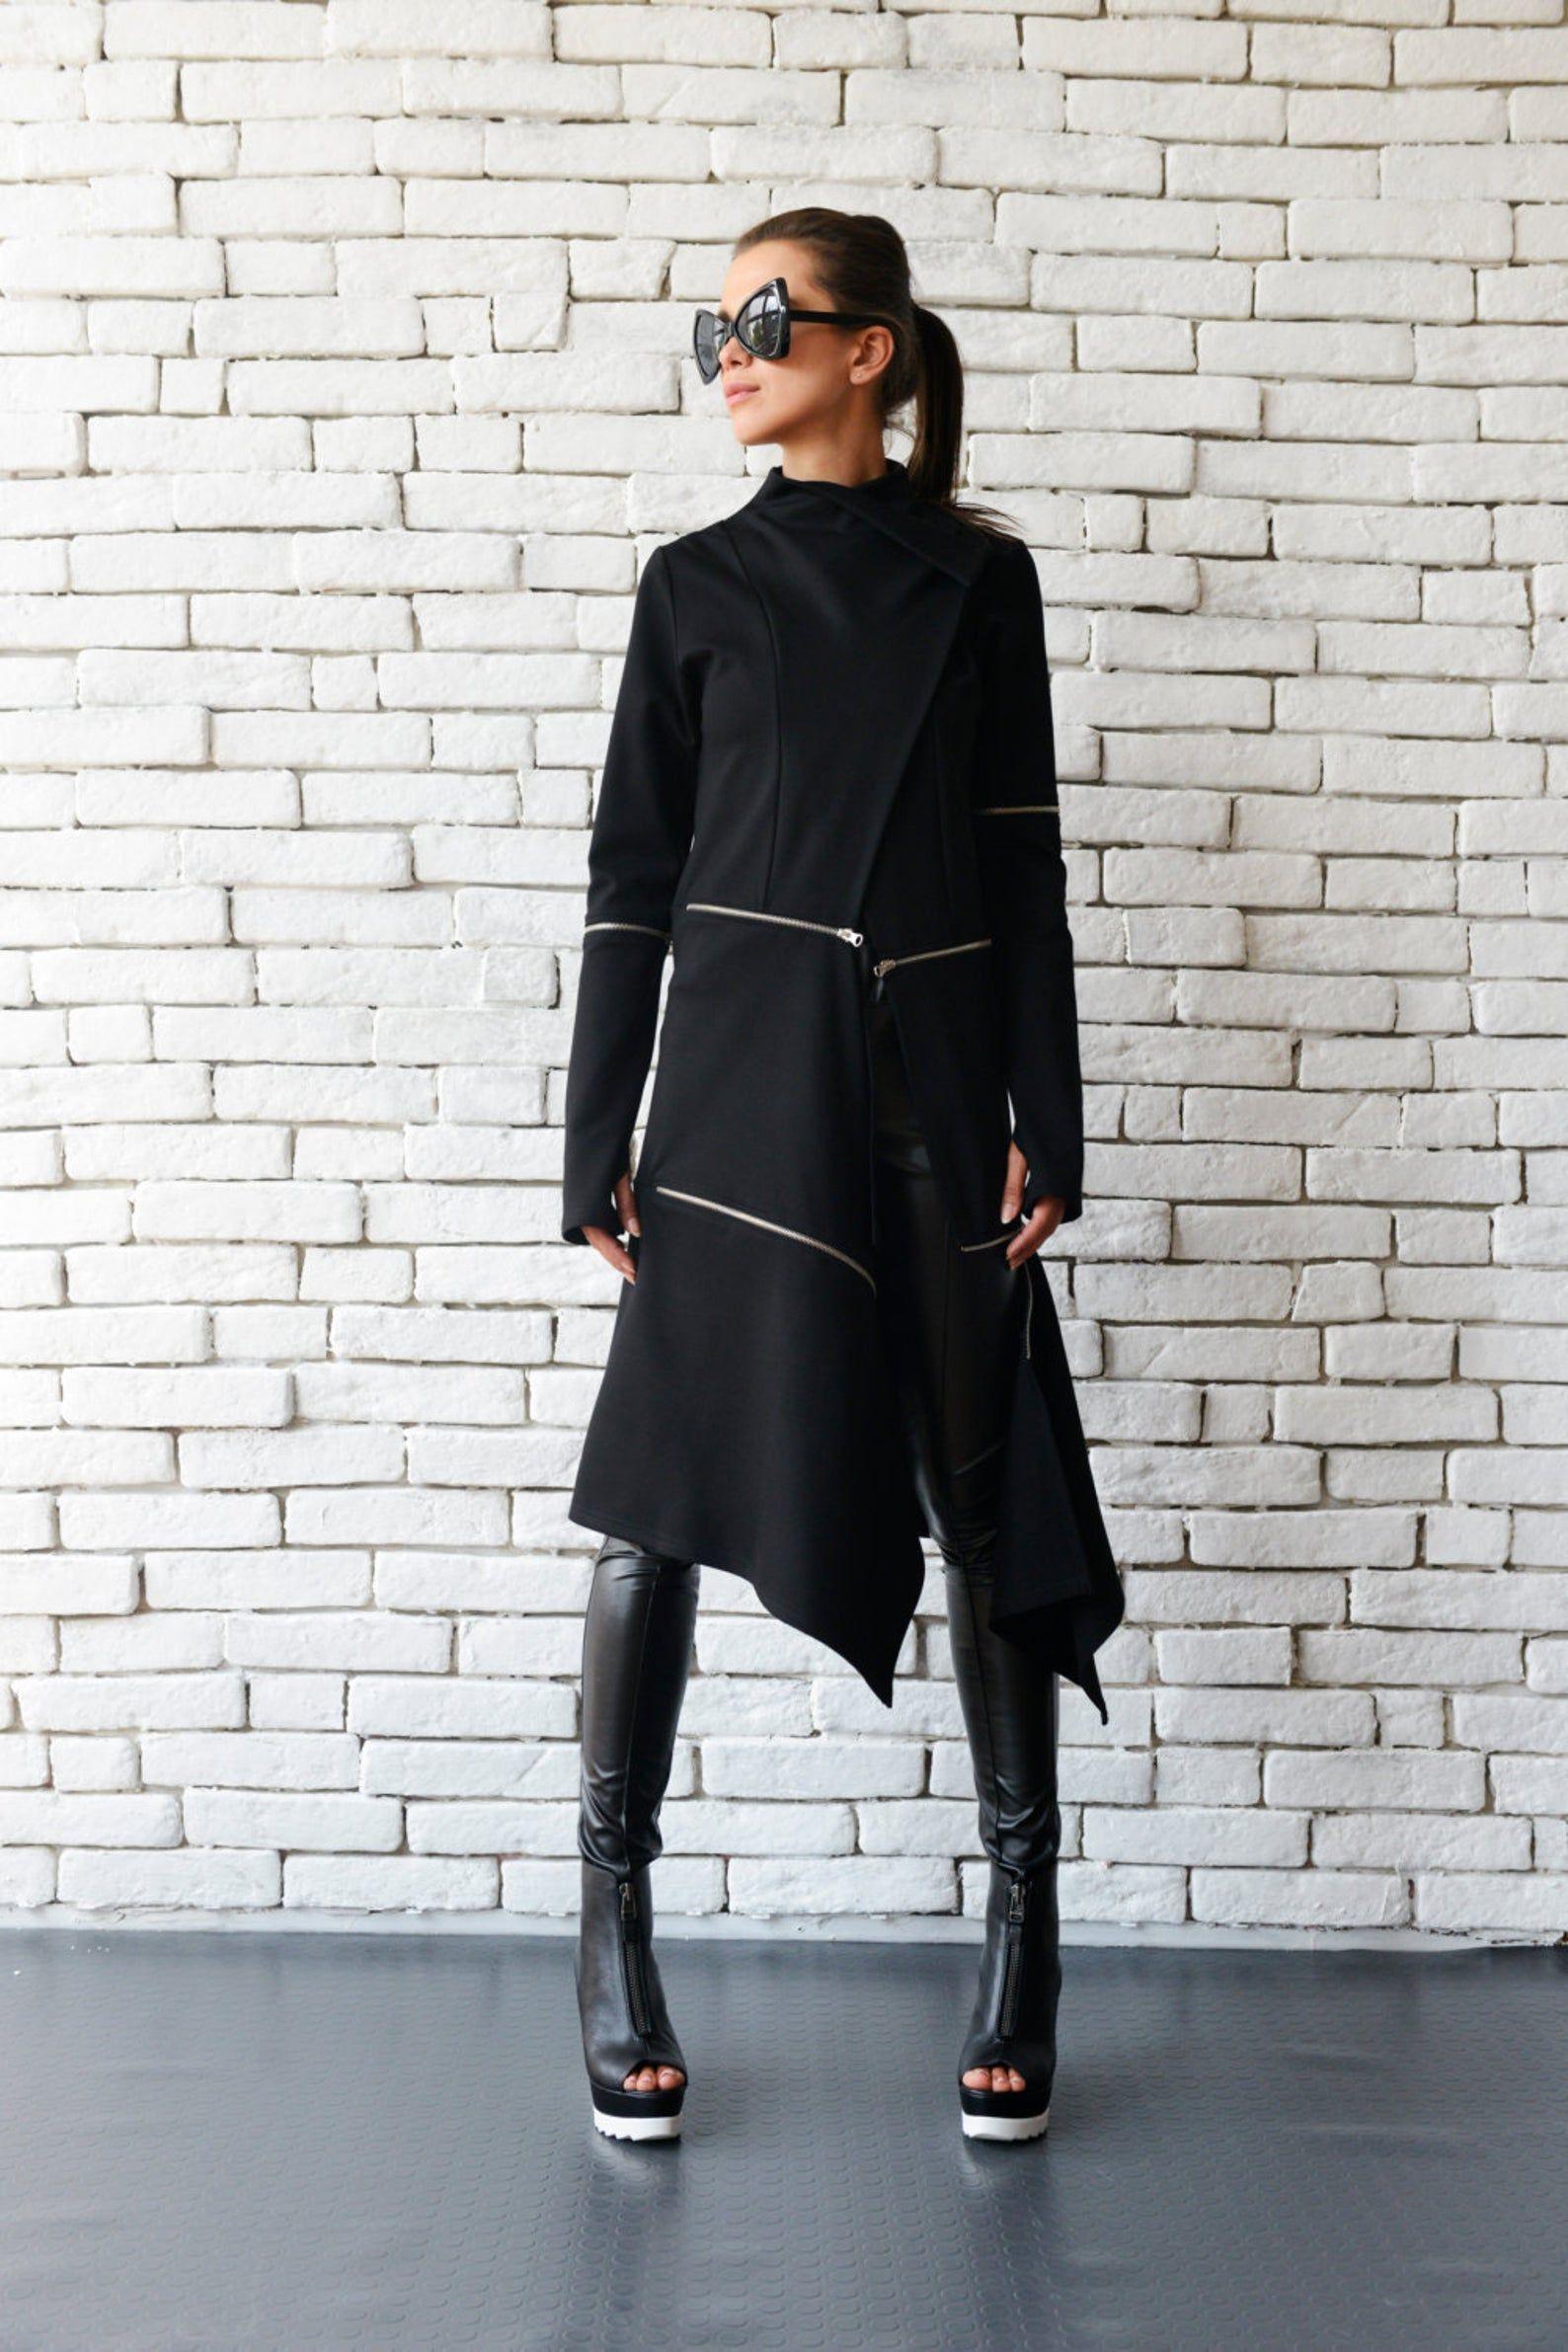 Black Tunic Black Cardigan Zipper Loose Blouse Womens Cardigan Plus Size Cardigan Plus Size Tunic Loose Tunic Oversize Tunic